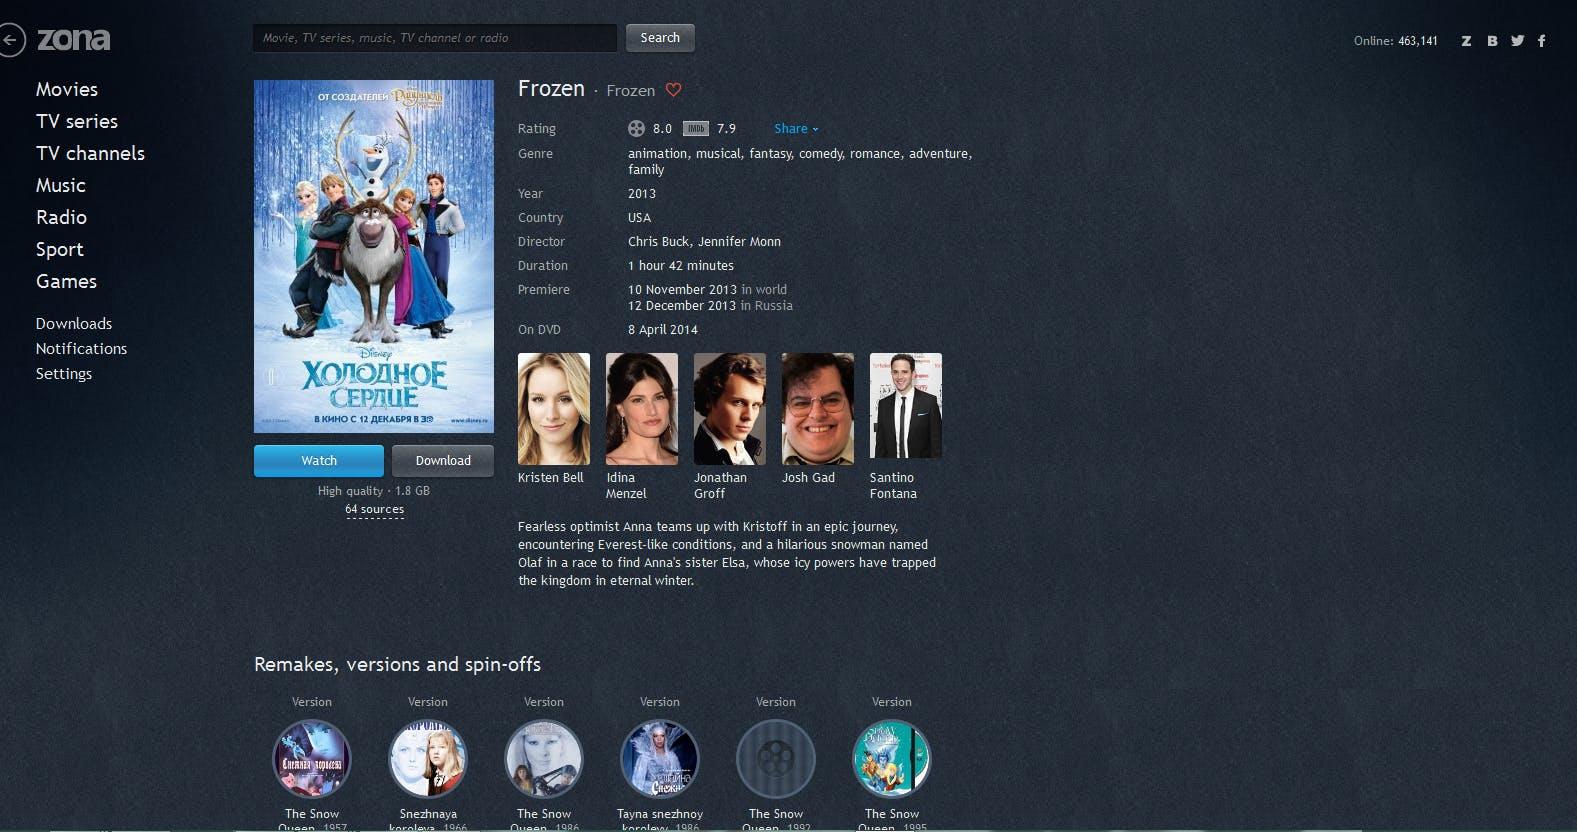 Zona Frozen movie page